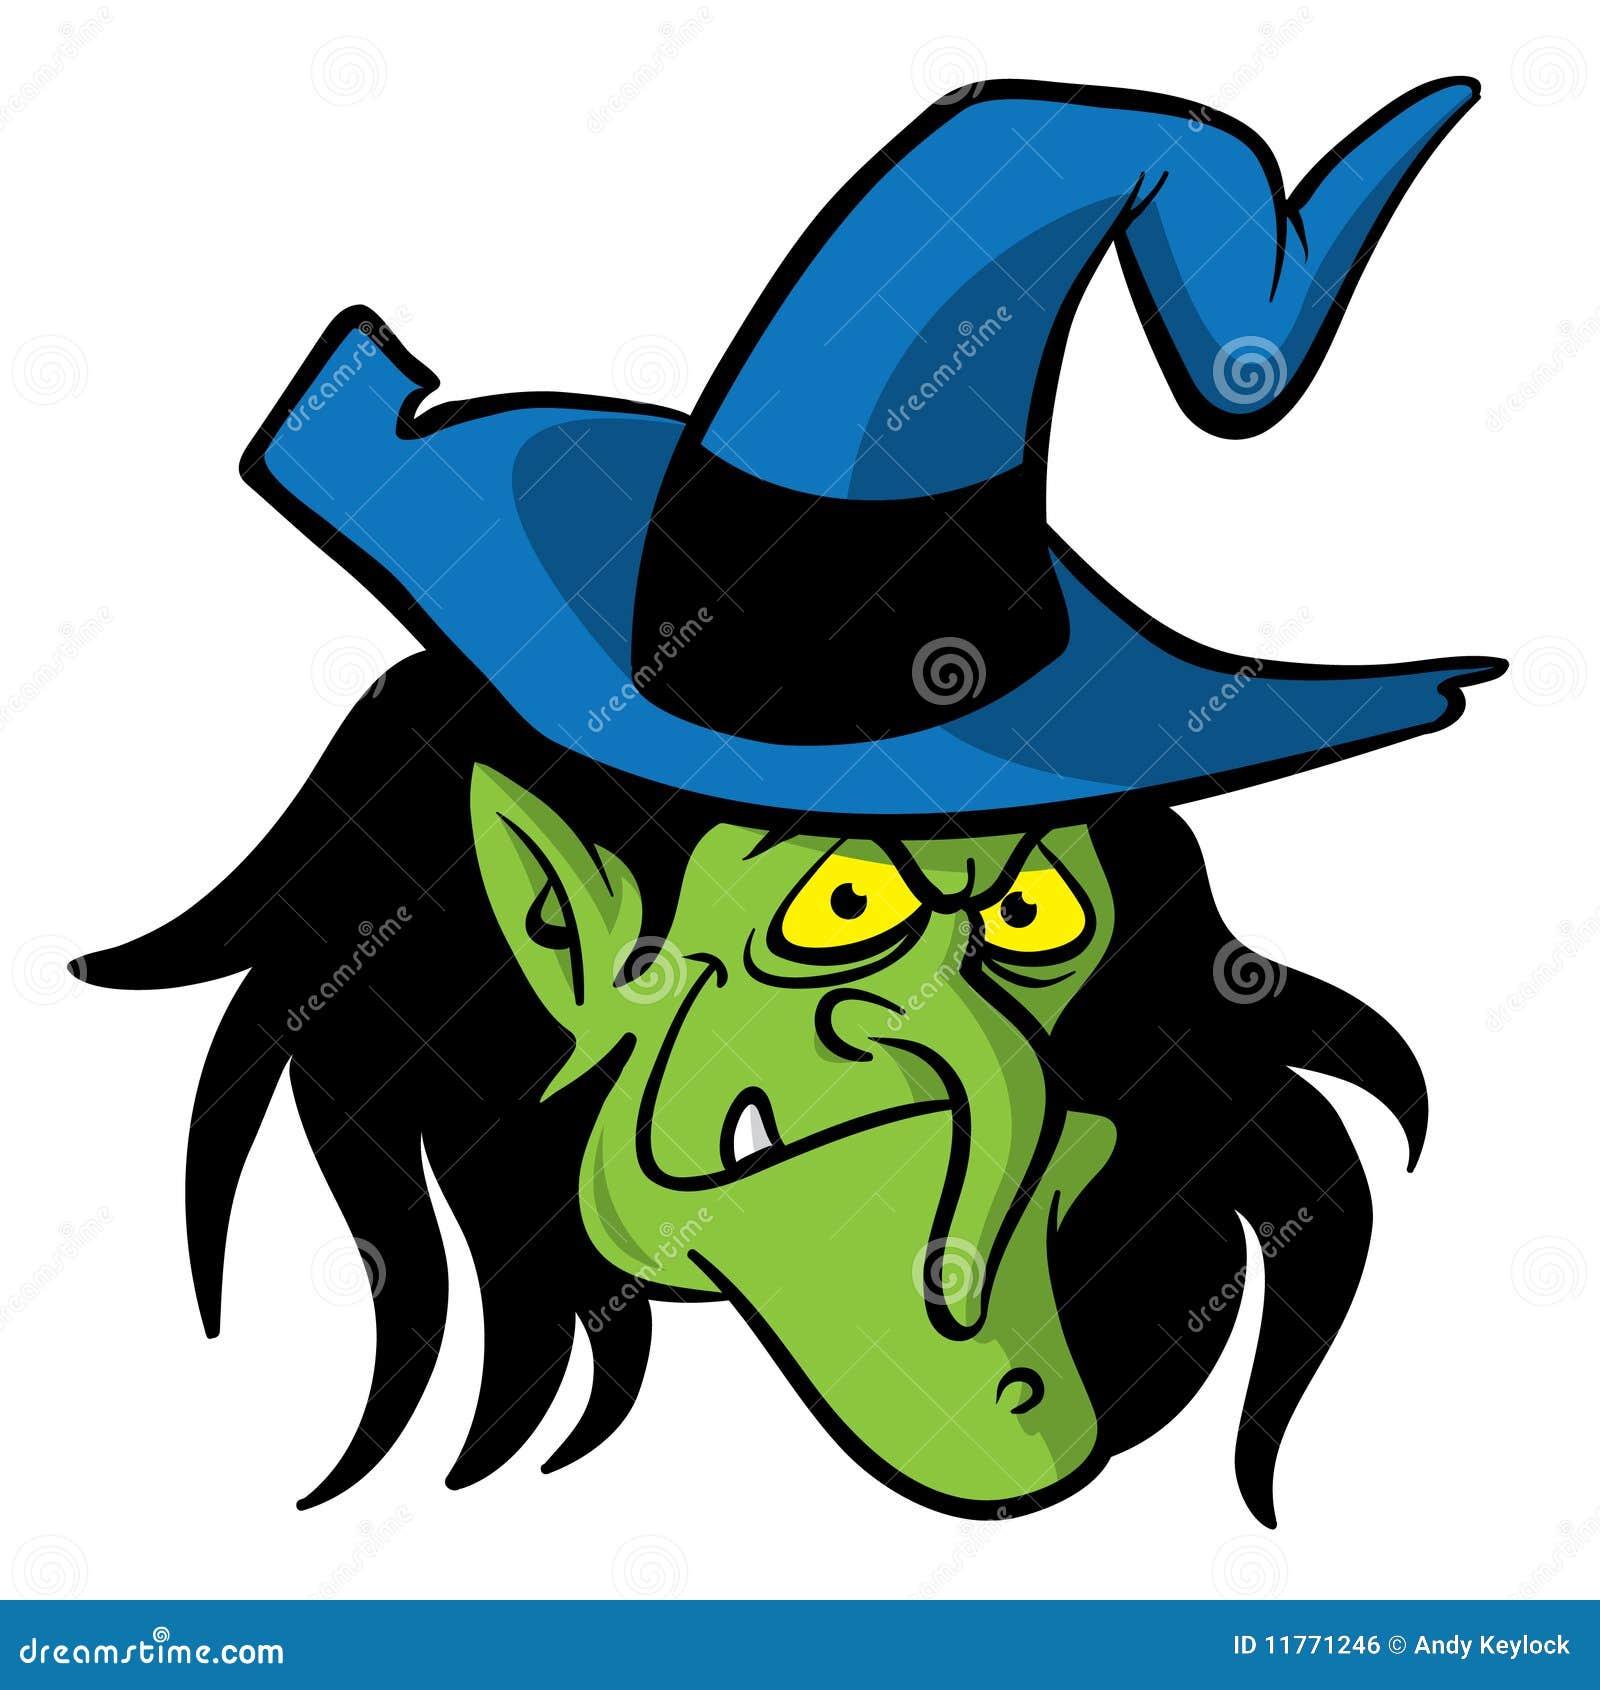 Witch Head Cartoon Illustration Royalty Free Stock Image - Image ...